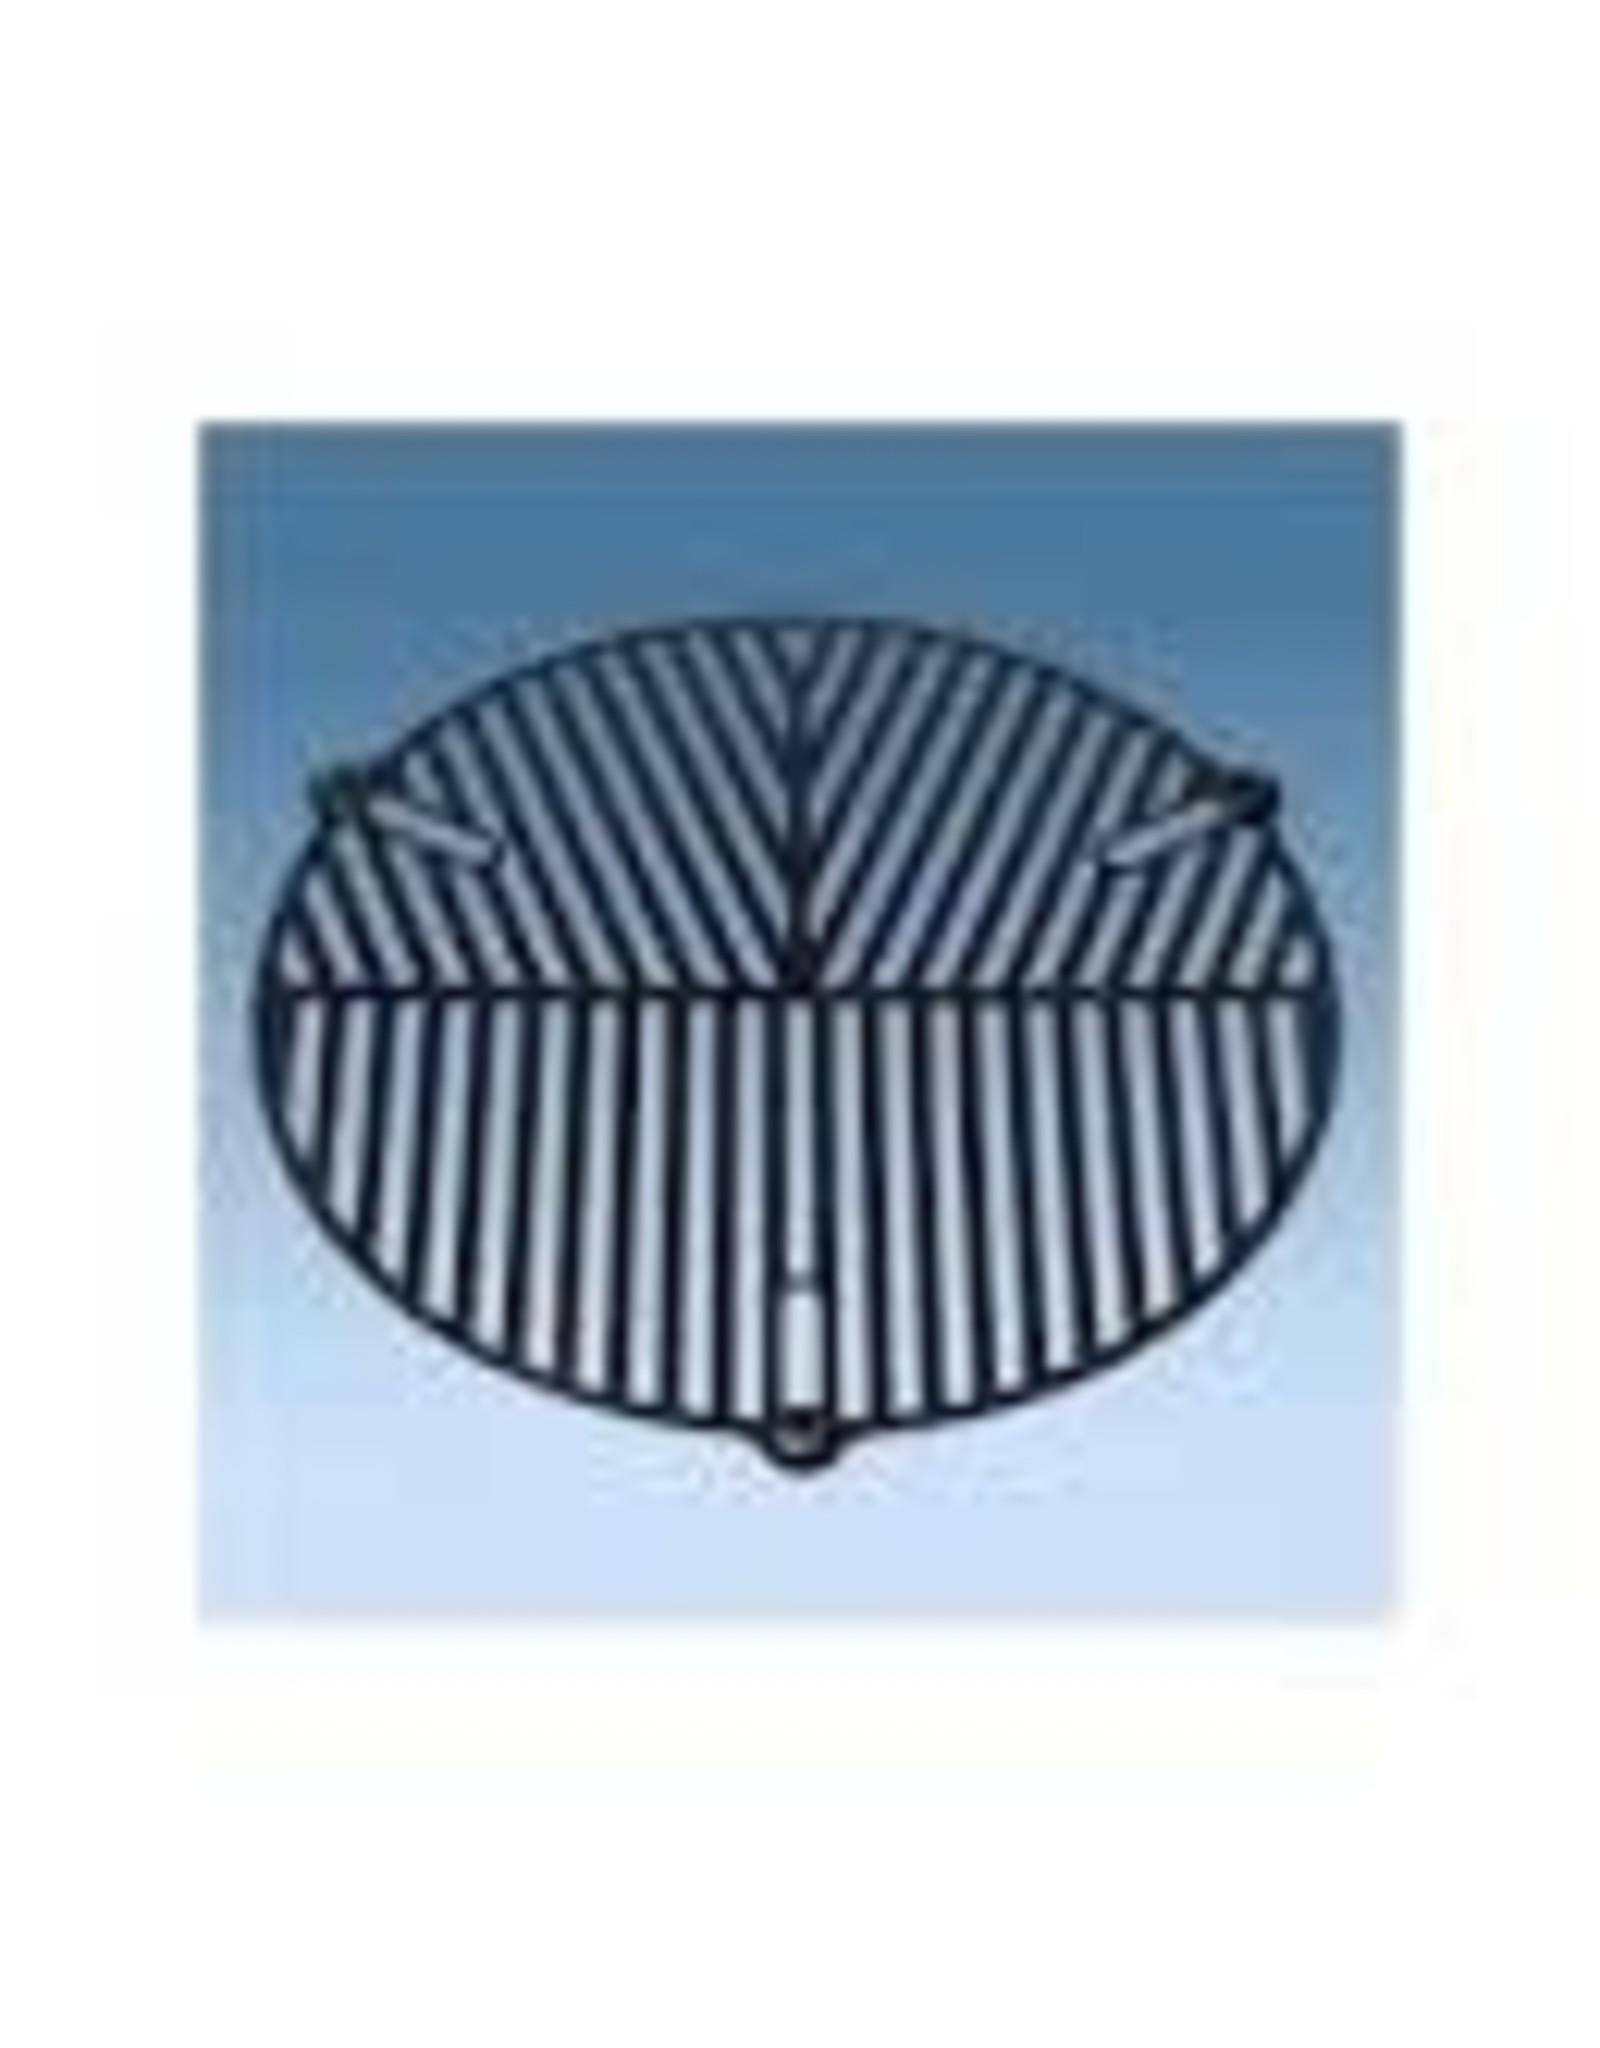 "Astrozap Adjustable Aluminum Bahtinov Mask 14-1/2""-17-1/2"" (368mm-444mm) Diameter - AZ-505"